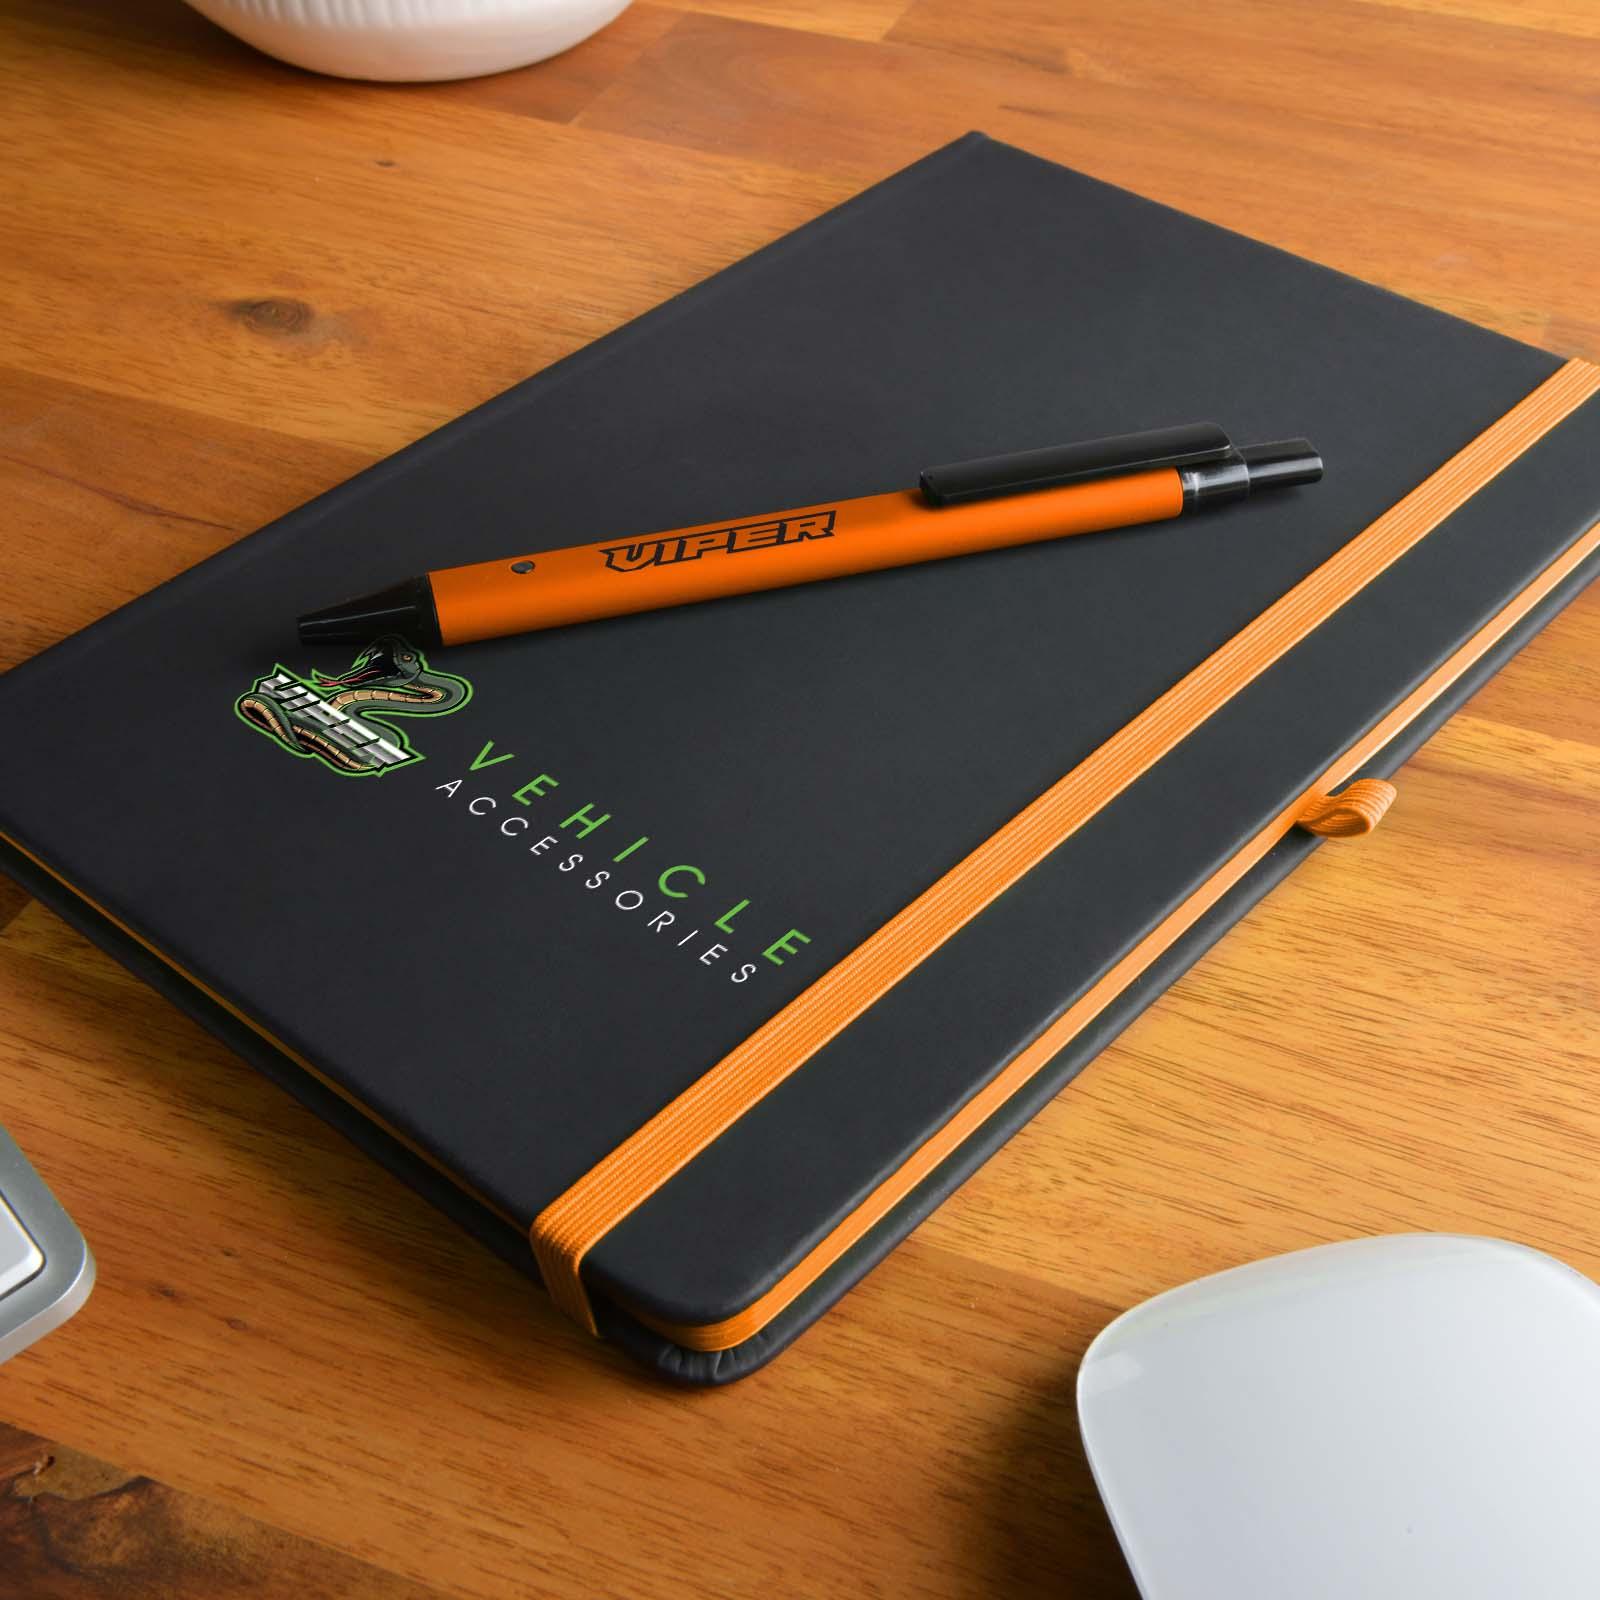 Venture Supreme Notebook / Slalom Pen